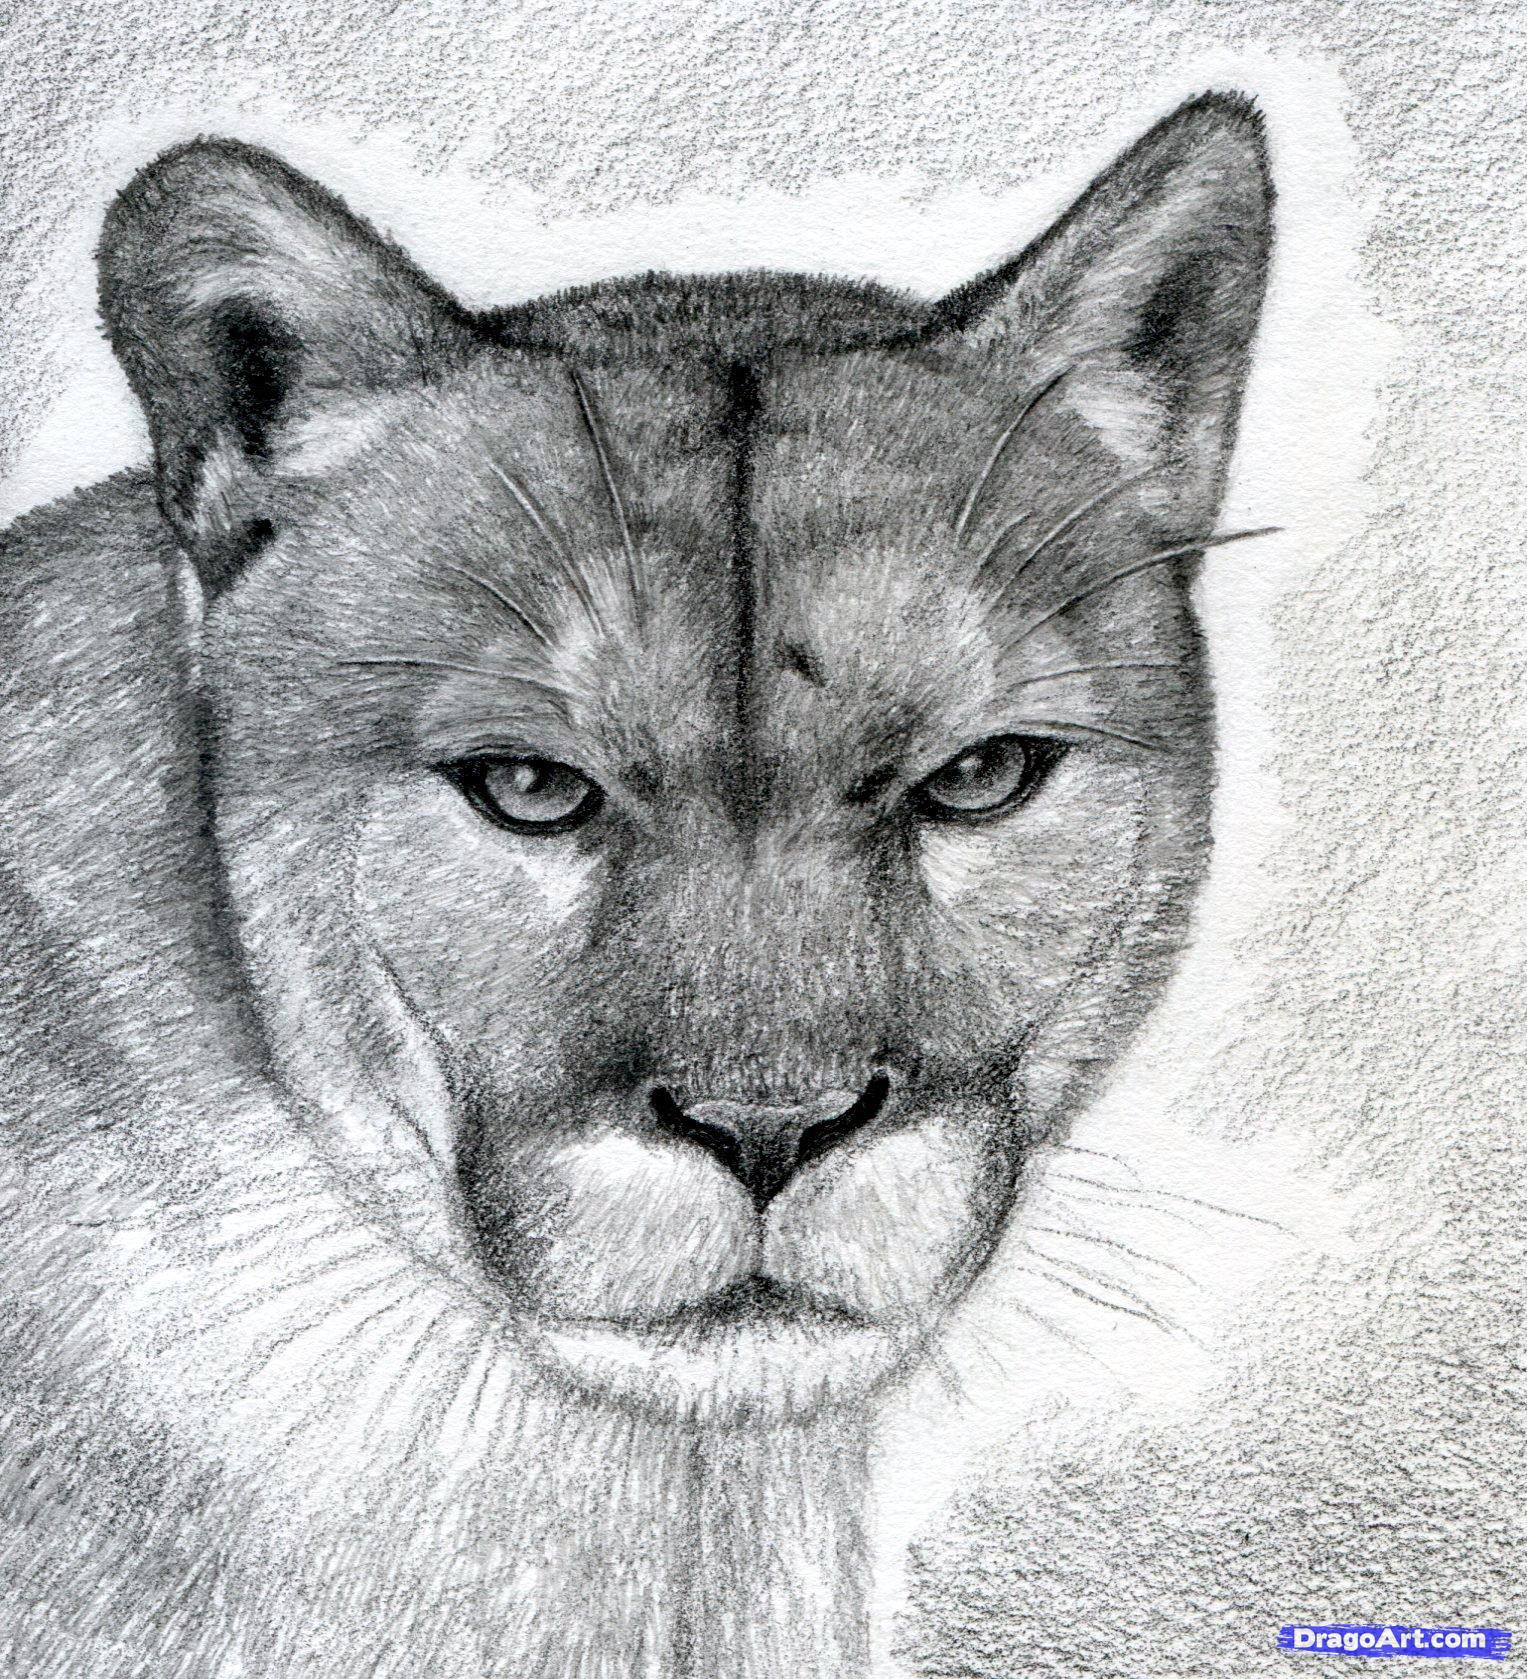 Drawn mountain realistic Drawing Lion lion Mountain Mountain